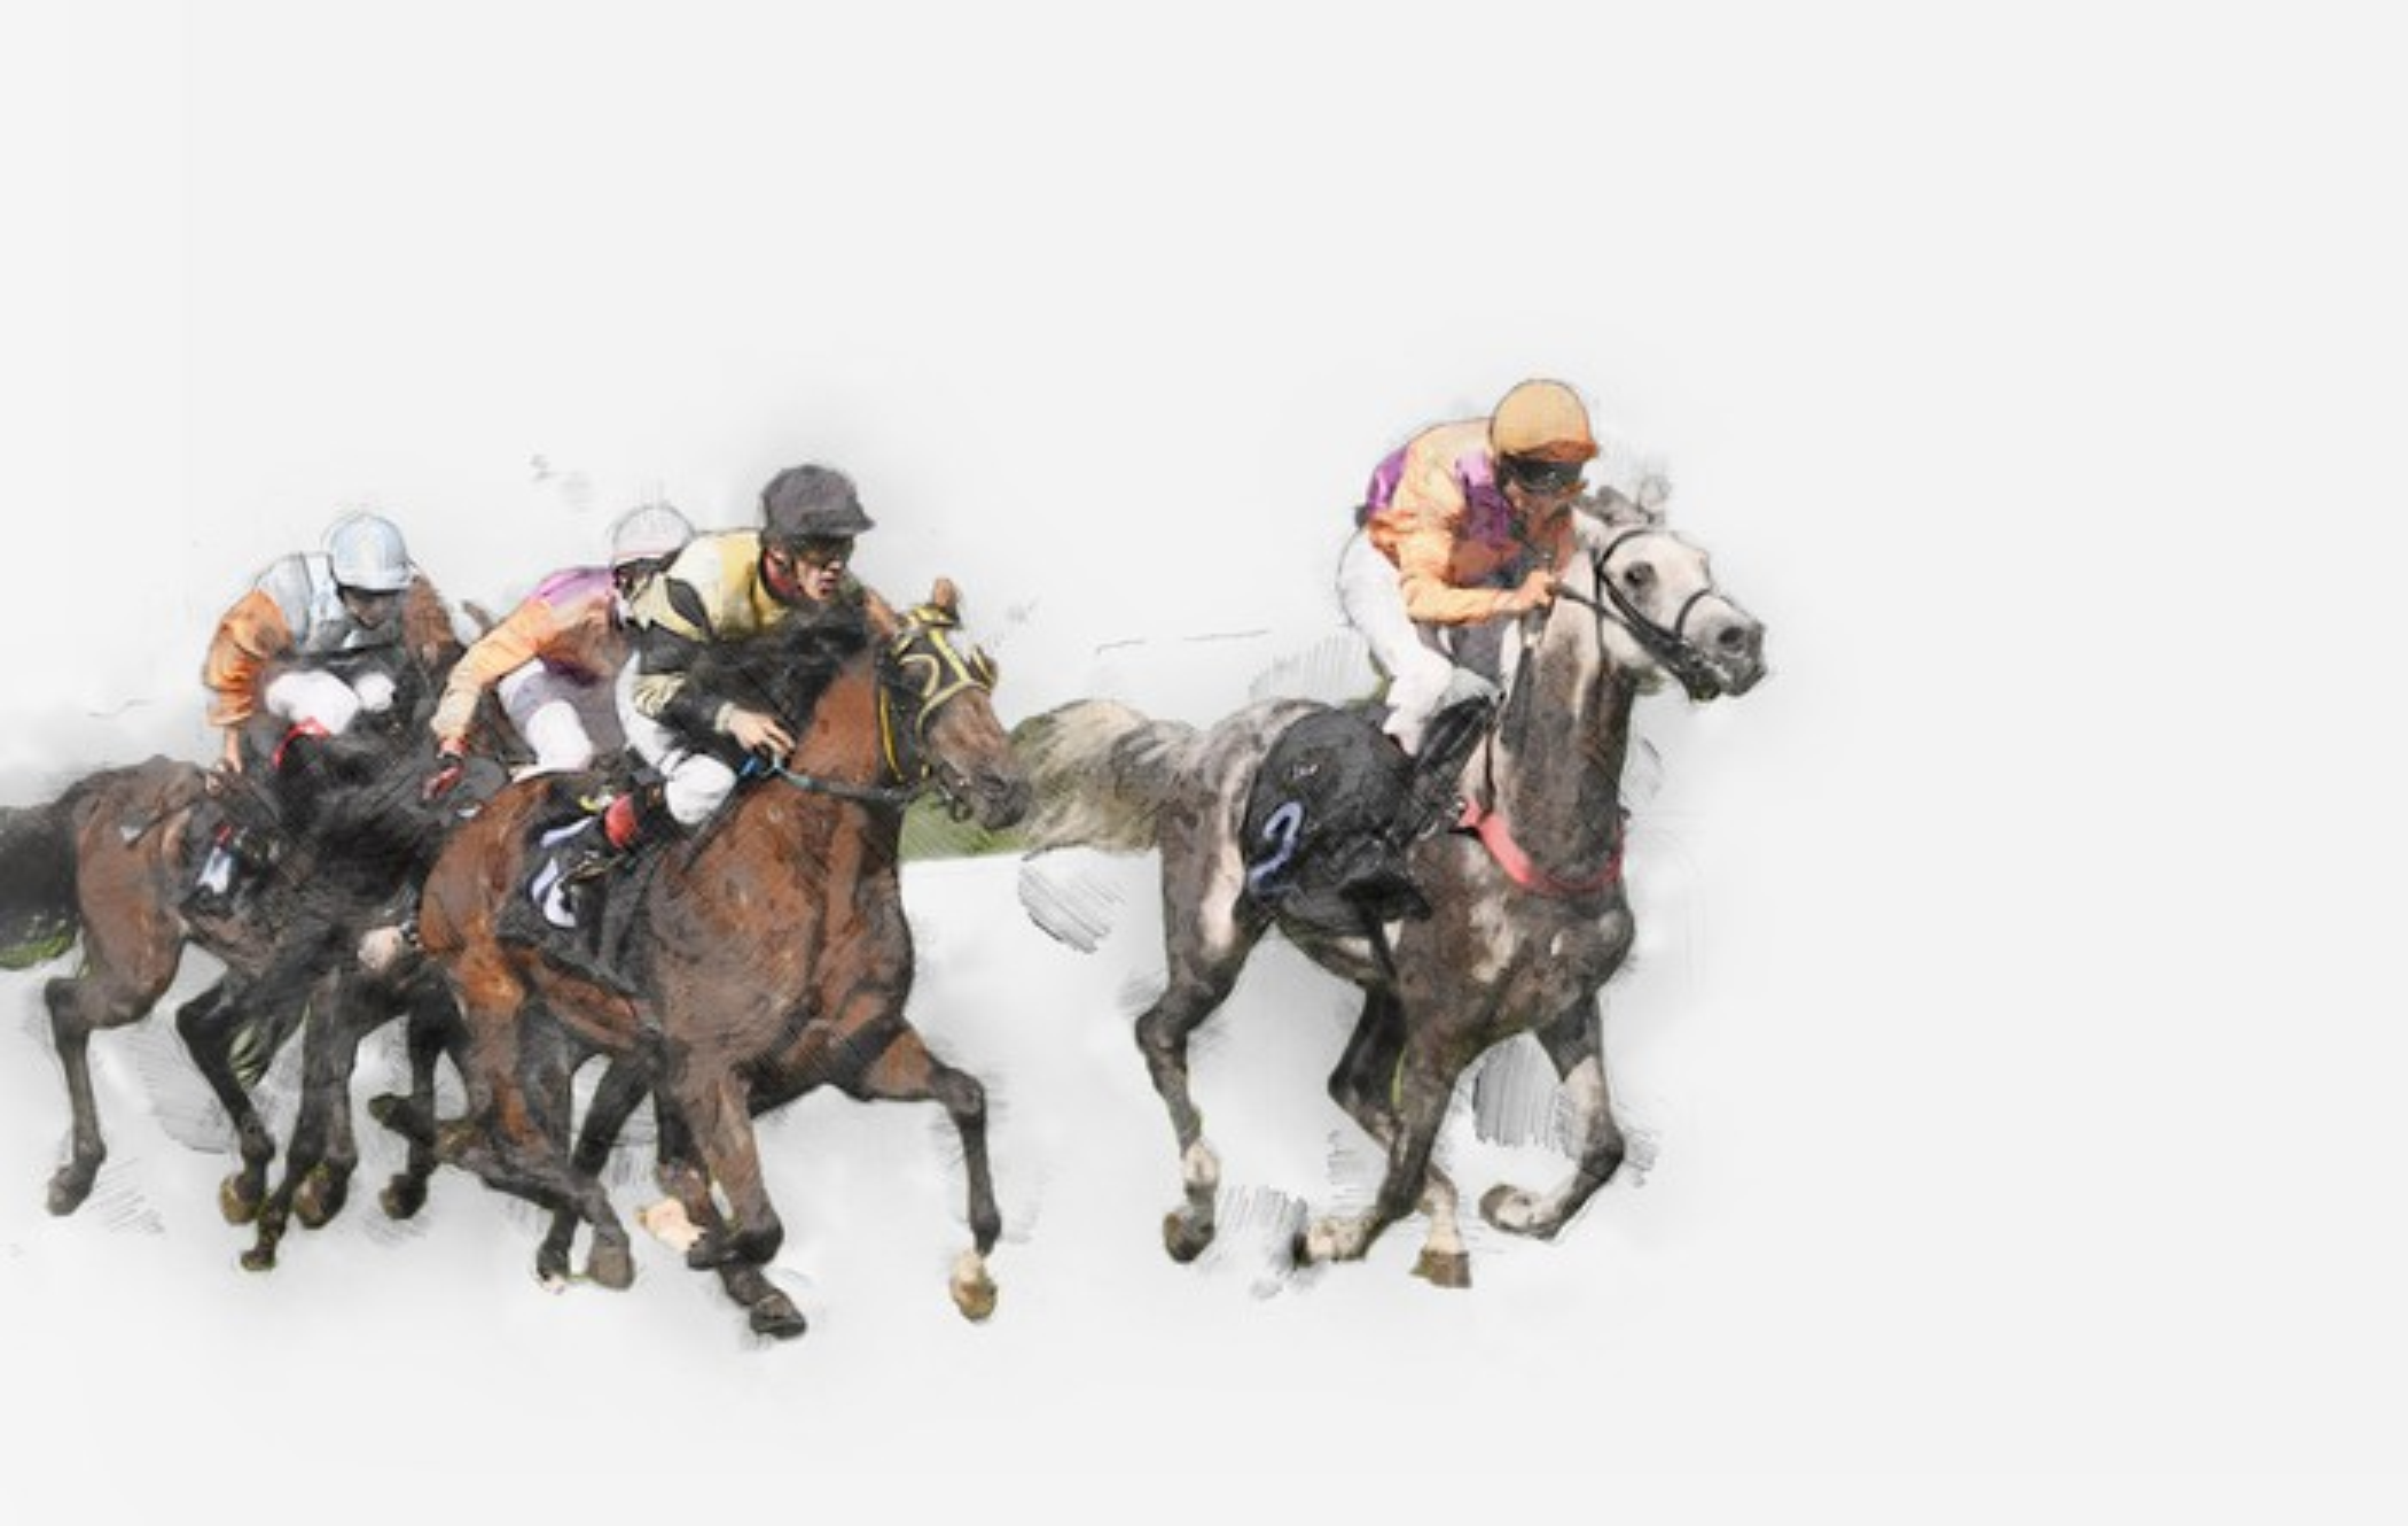 A drawing of jockeys riding horses in a race.